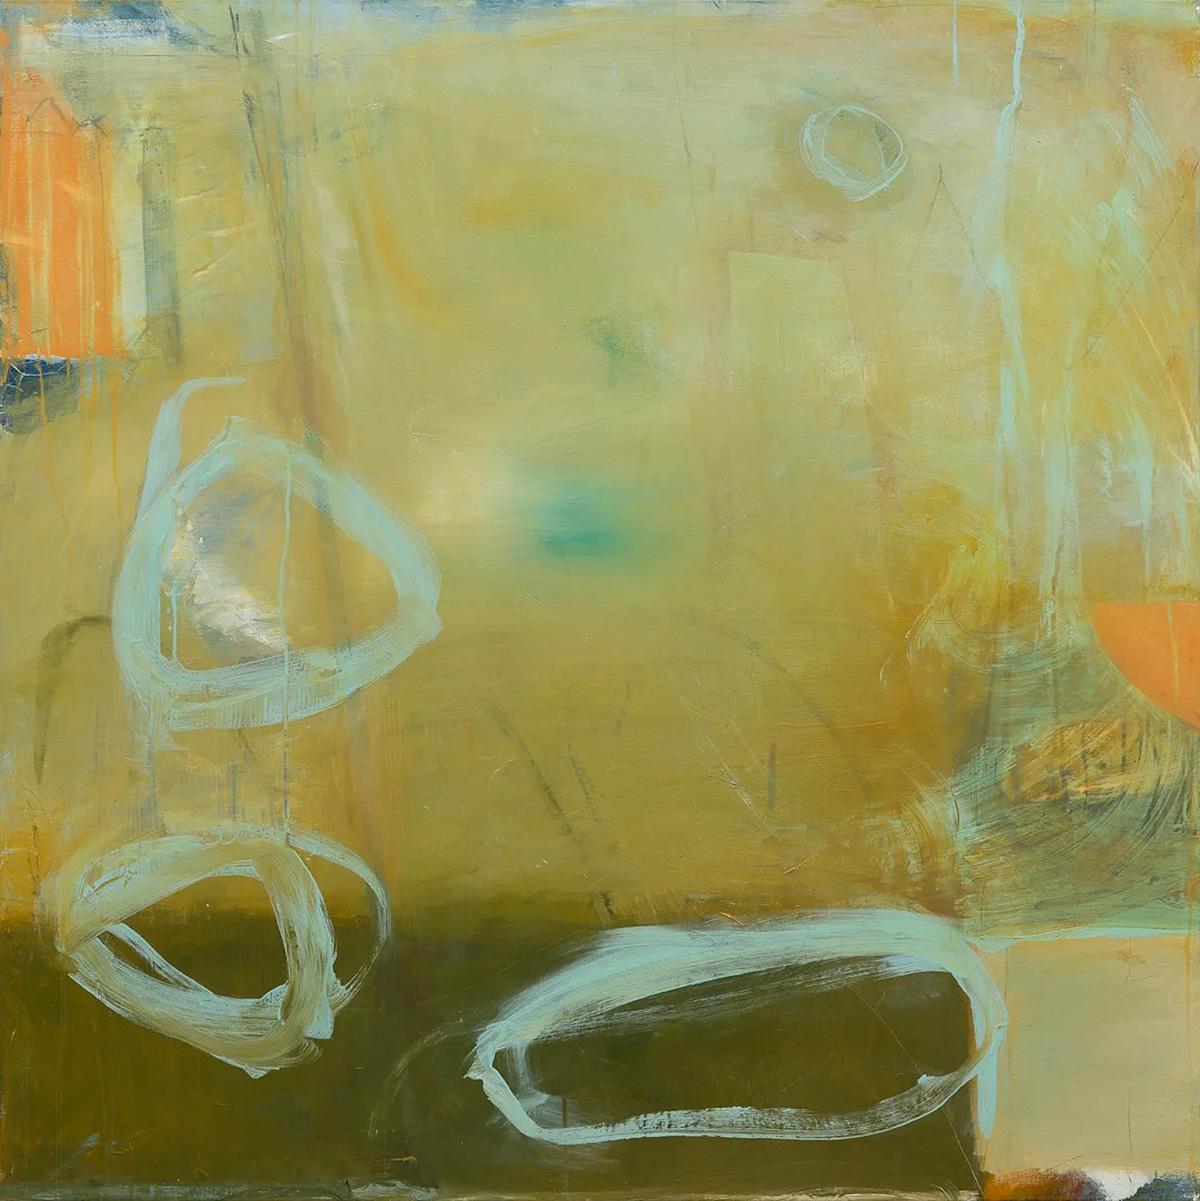 David Mankin, 'Idle Hill', mixed media on wood panel